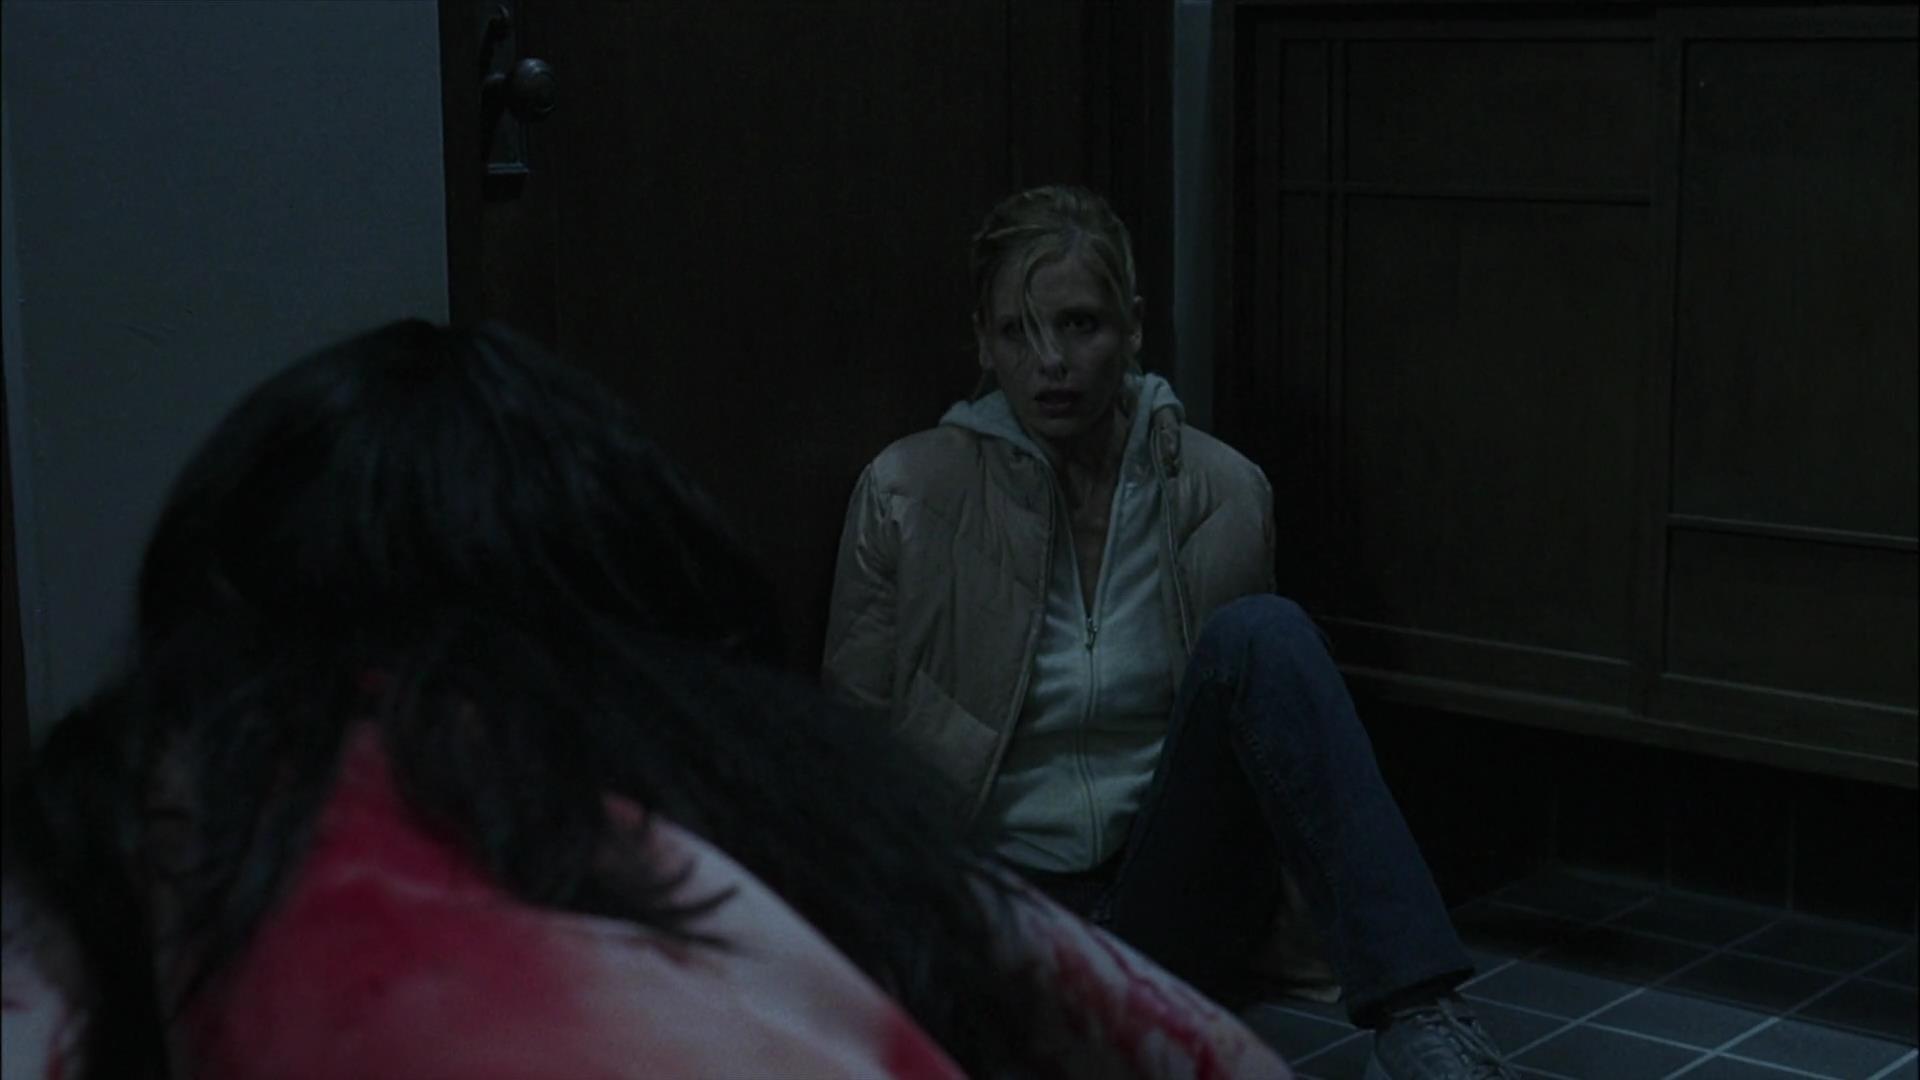 Sarah Michelle Gellar in The Grudge (2004) - Horror Actresses Photo (43438316) - Fanpop